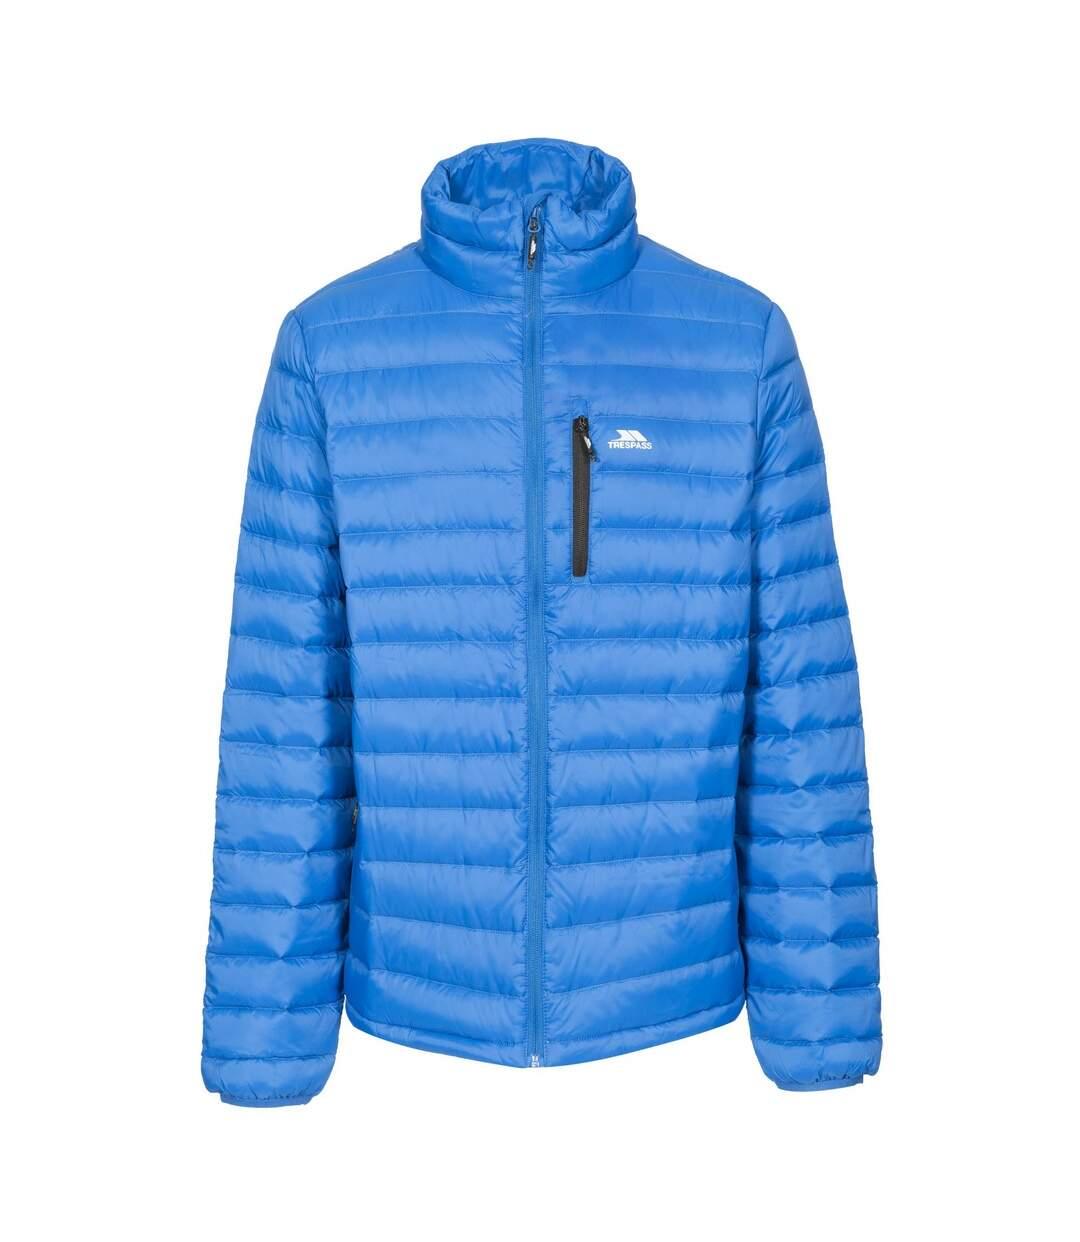 Trespass Mens Stellan Jacket (Blue) - UTTP4250